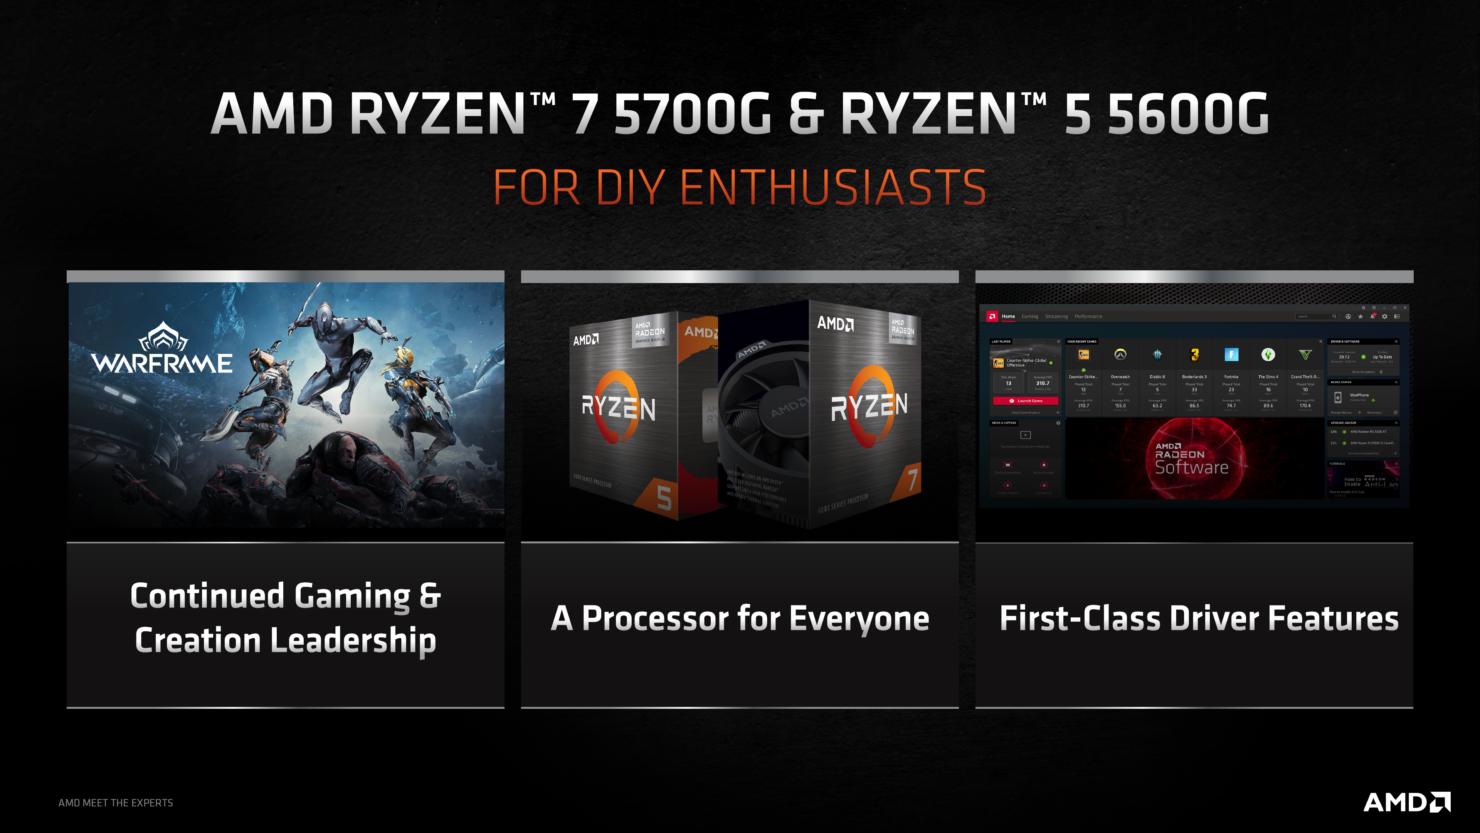 amd-ryzen-5000g-desktop-apus-launch-_-ryzen-7-5700g-ryzen-5-5600g-_16